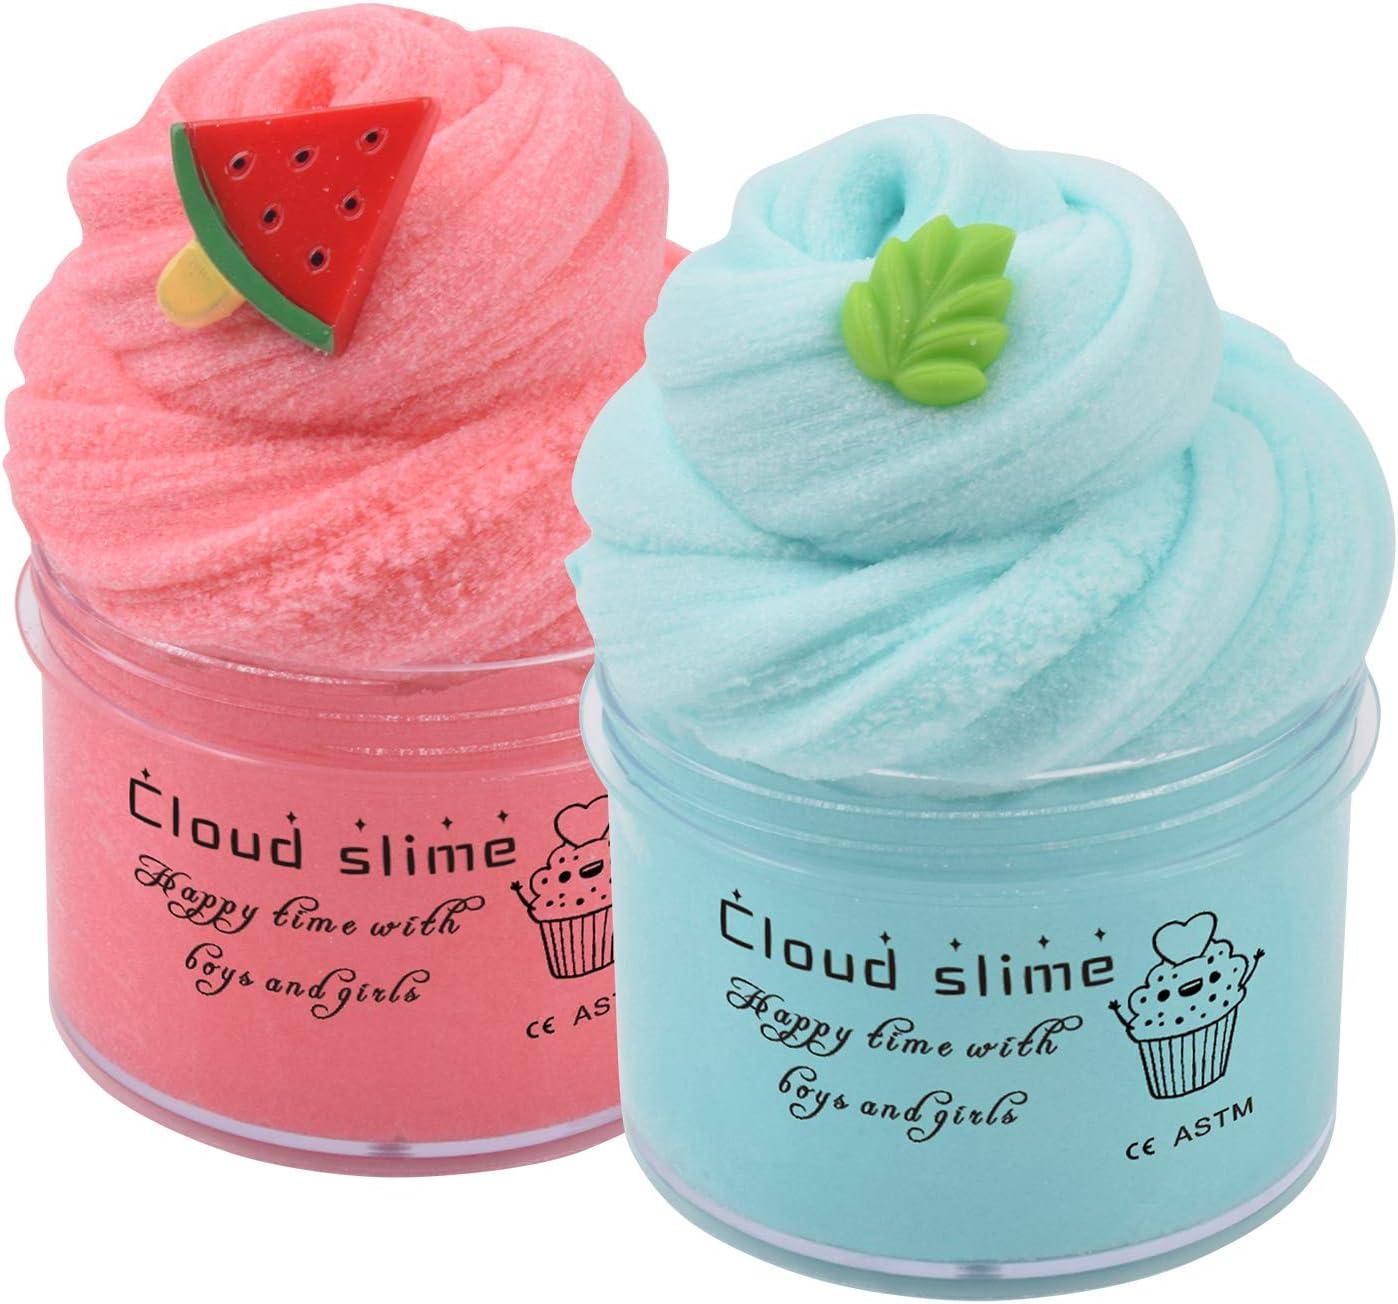 Watermelon Cloud Slime 12oz